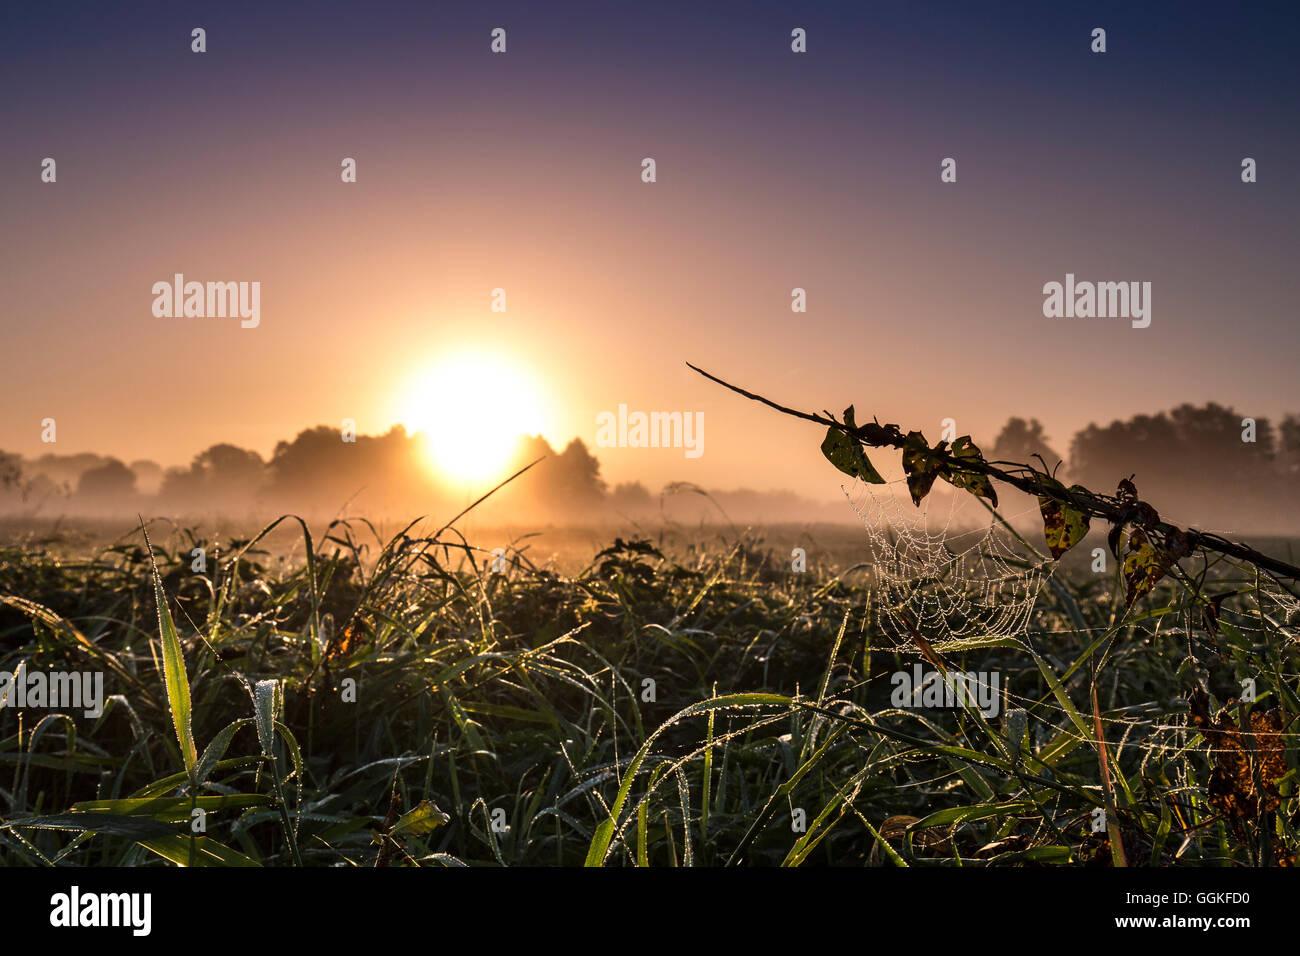 Sunrise near Worpswede, Teufelsmoor, Lower Saxony, Germany - Stock Image